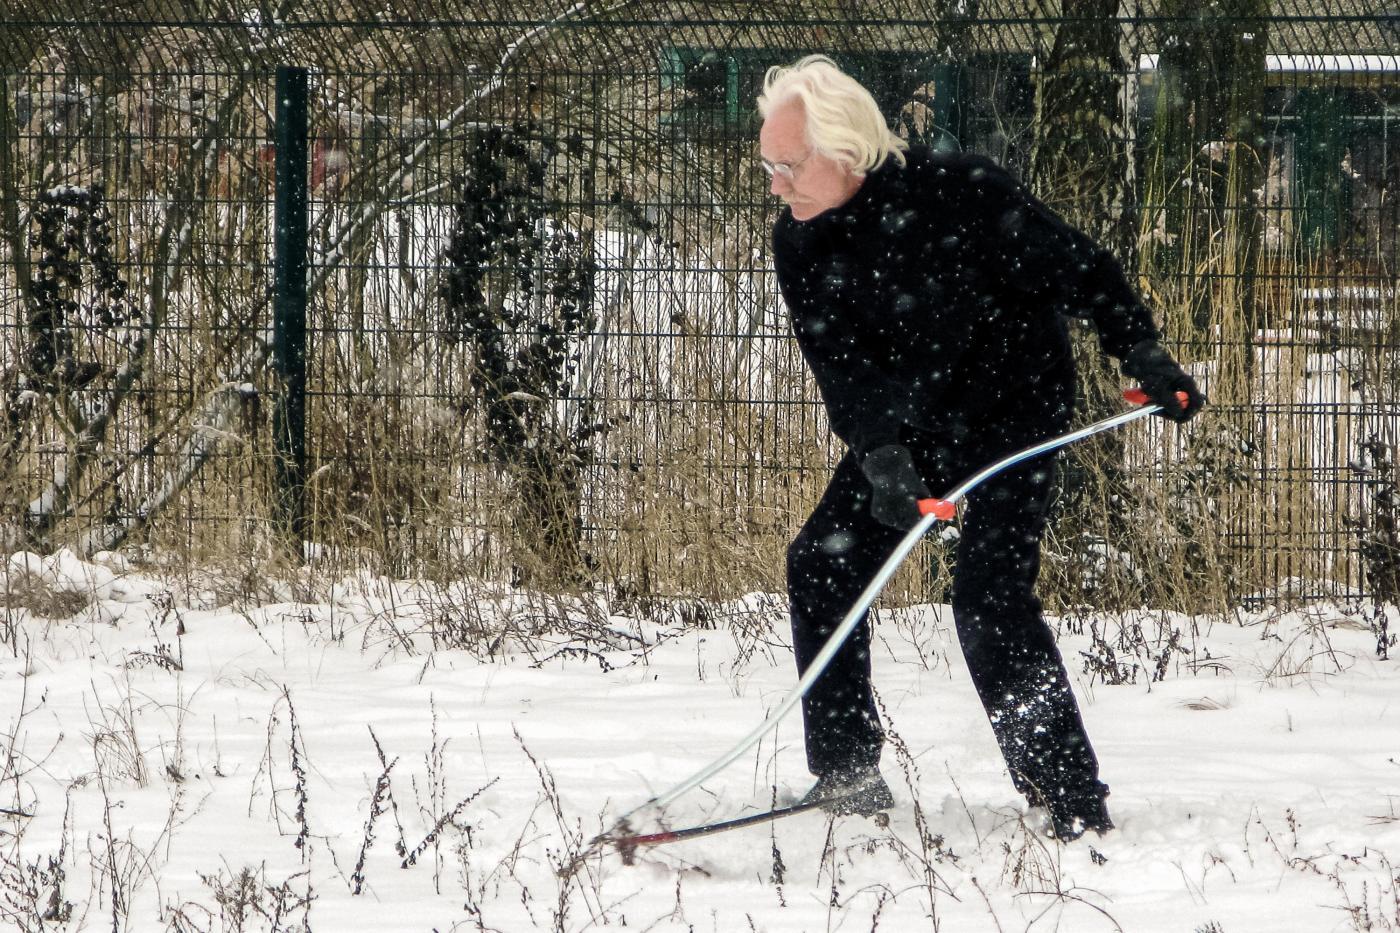 Fried Rosenstock: Winterschnitt